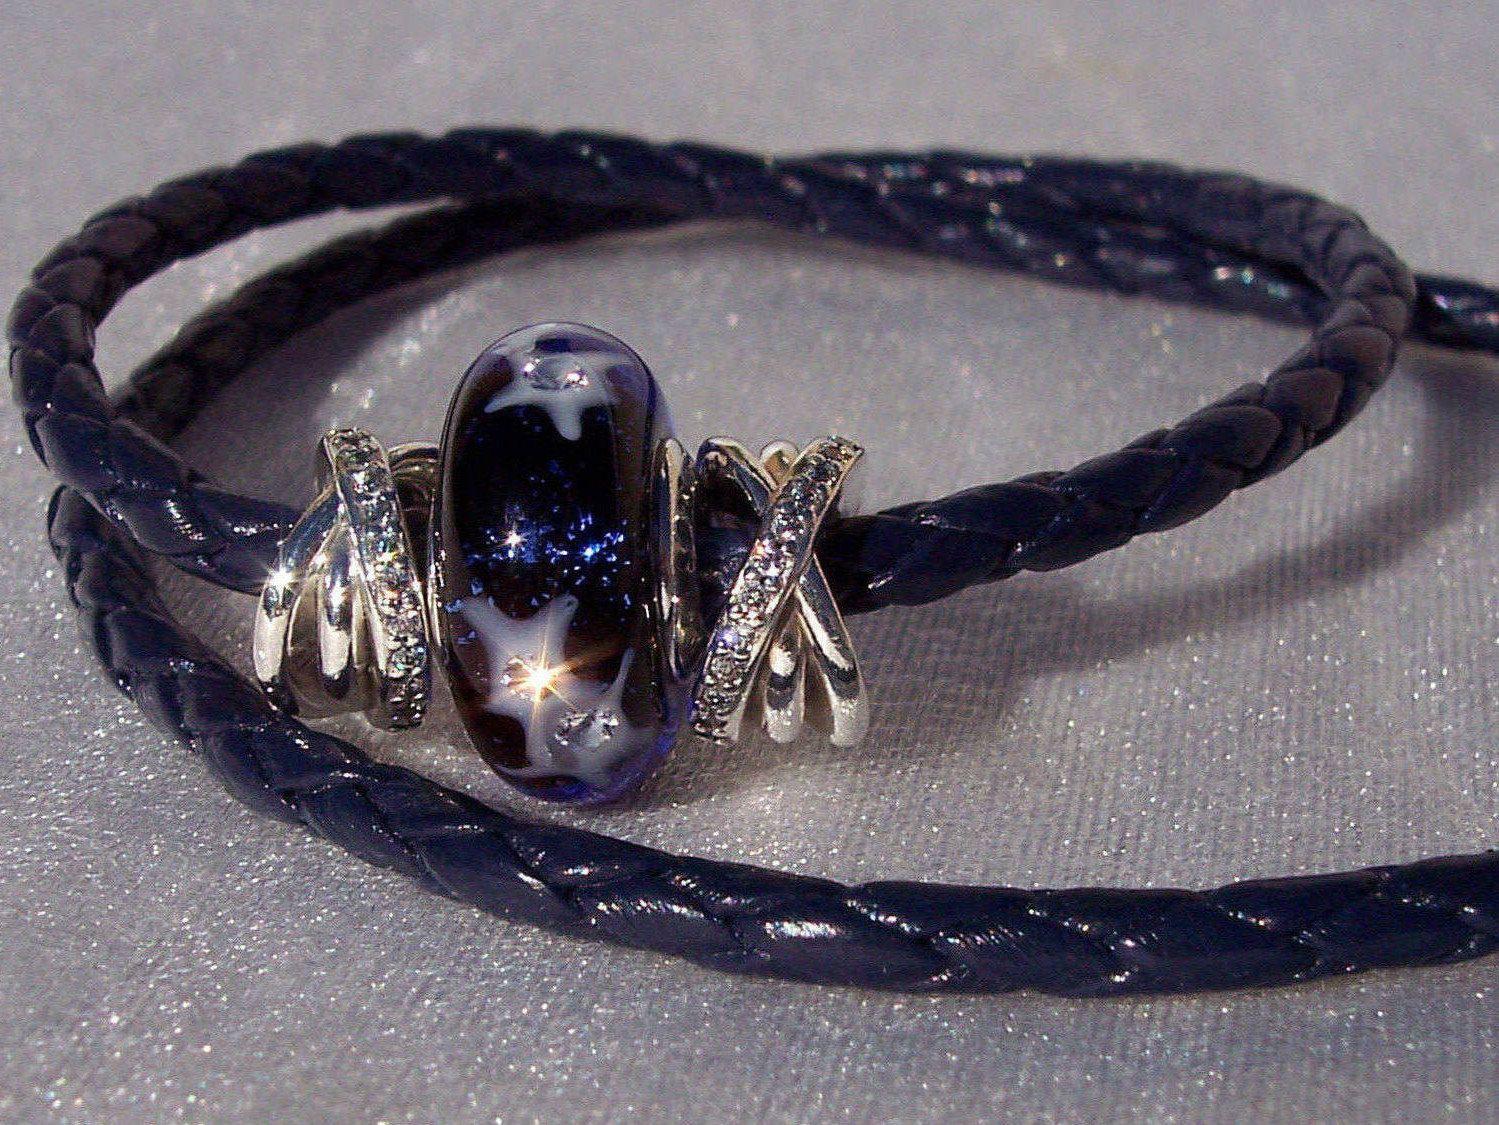 b4cdf2c79 ... canada pandora starry night sky galaxy bracelet set double leather  spacers c8b43 e770e